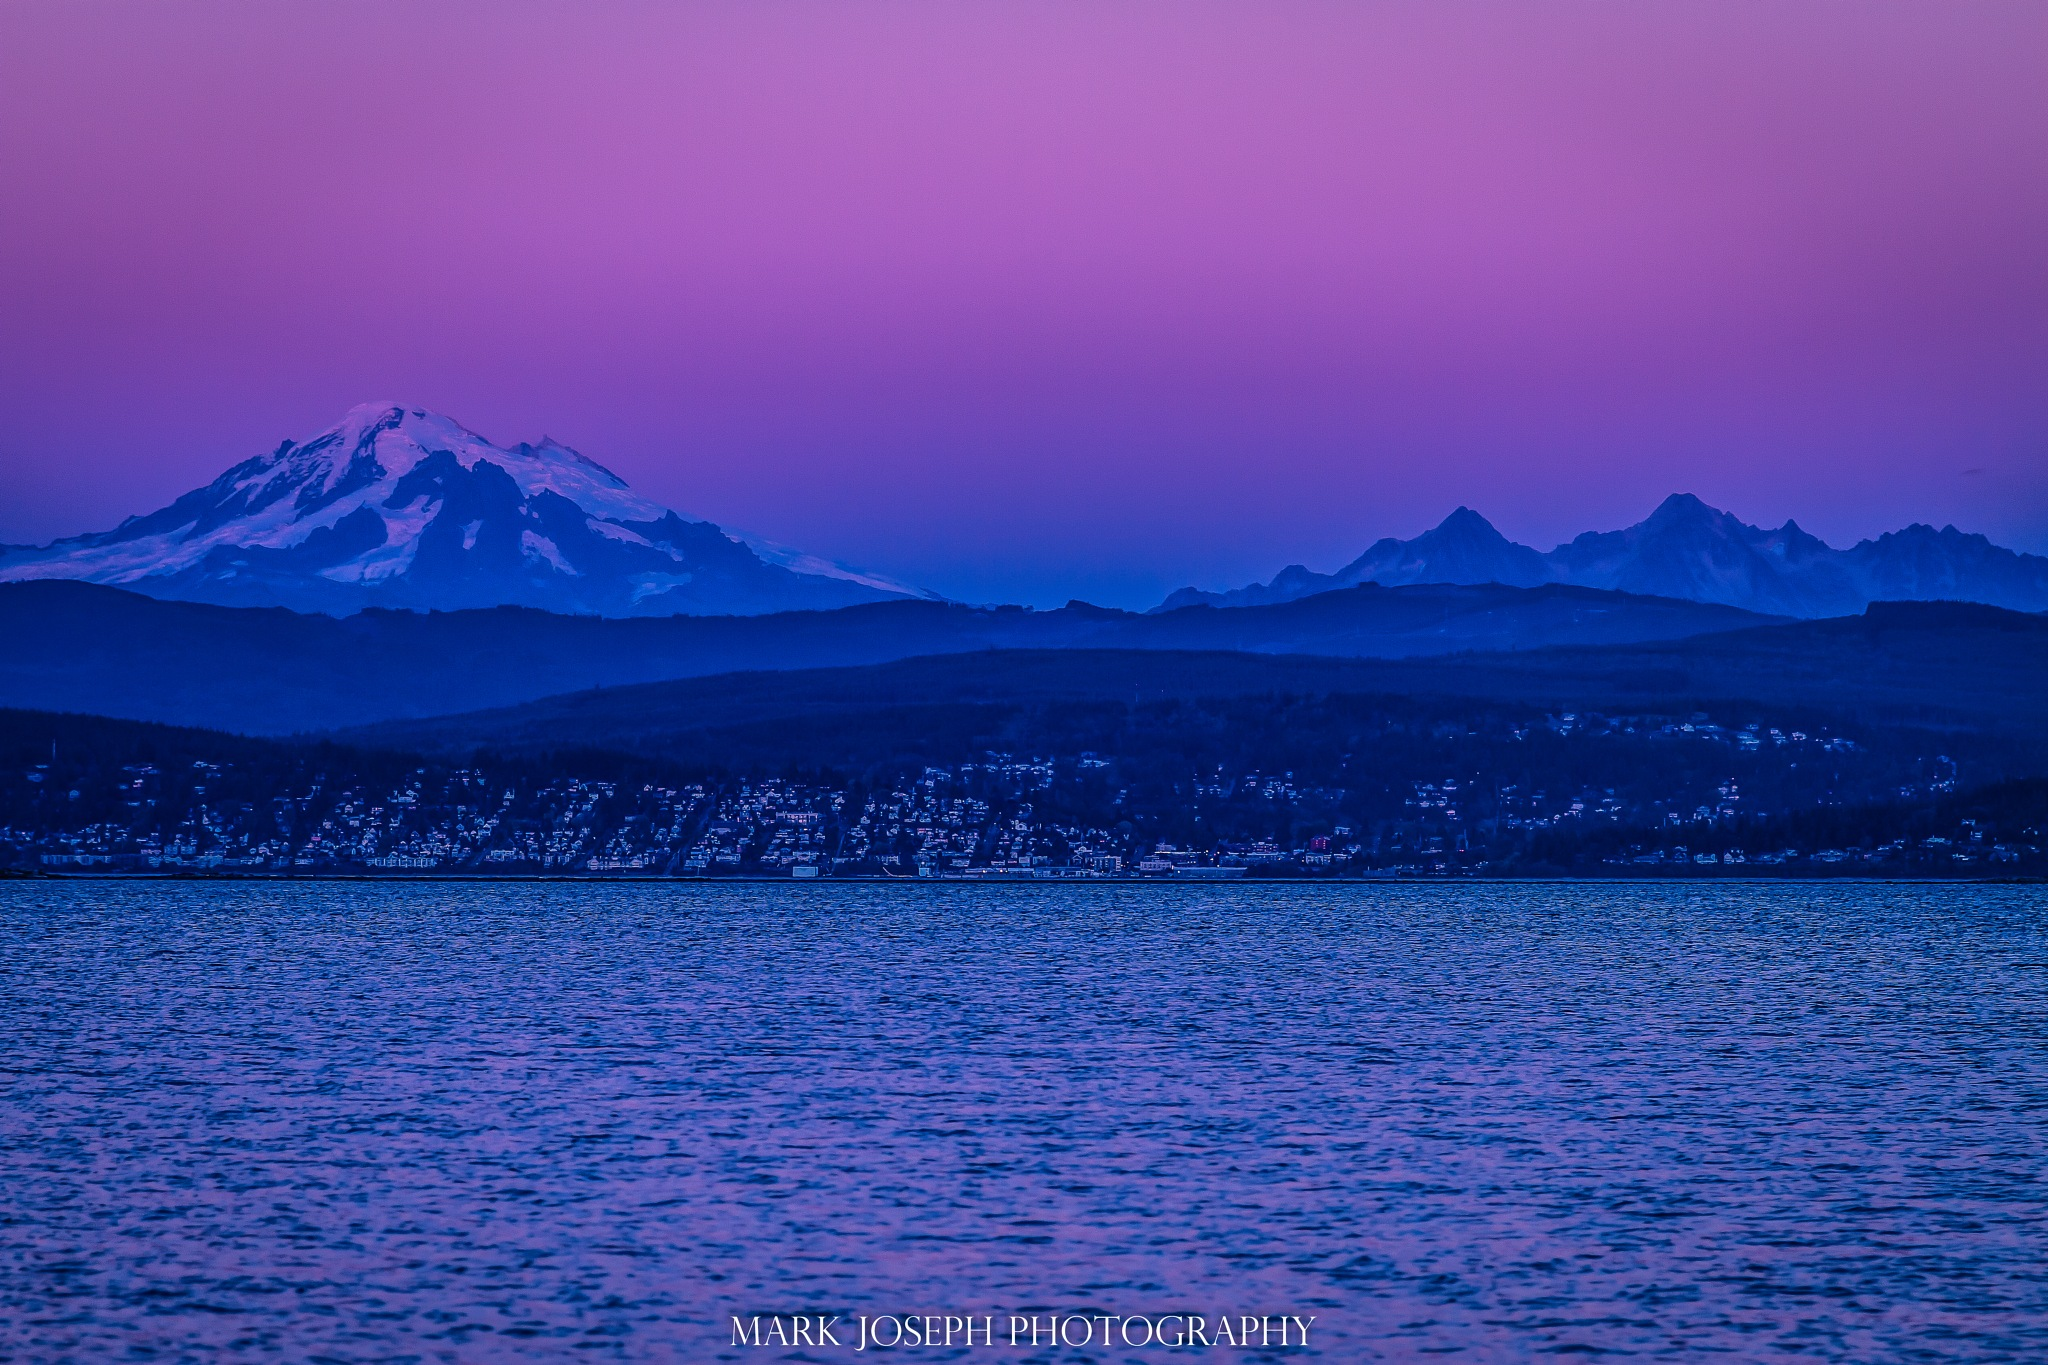 The Beauty of Mt. Baker by Mark Joseph